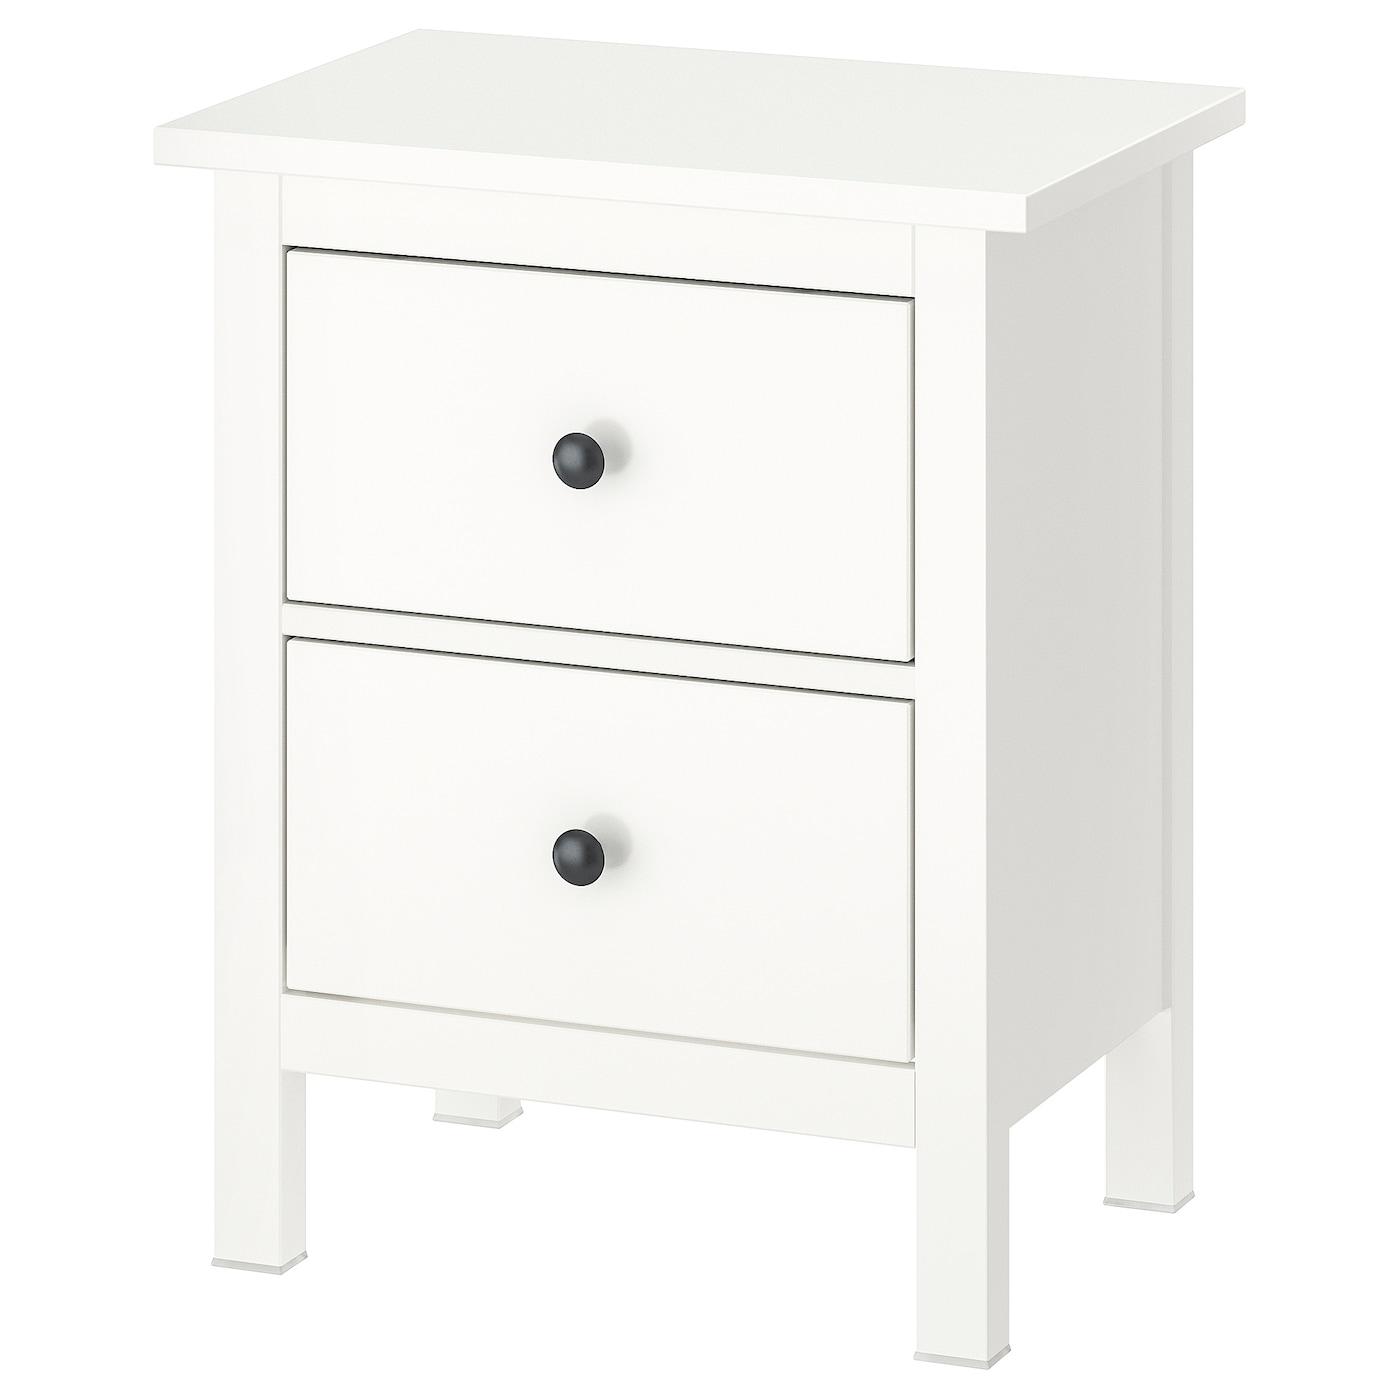 Hemnes 2 Drawer Chest White 21 1 4x26 Ikea